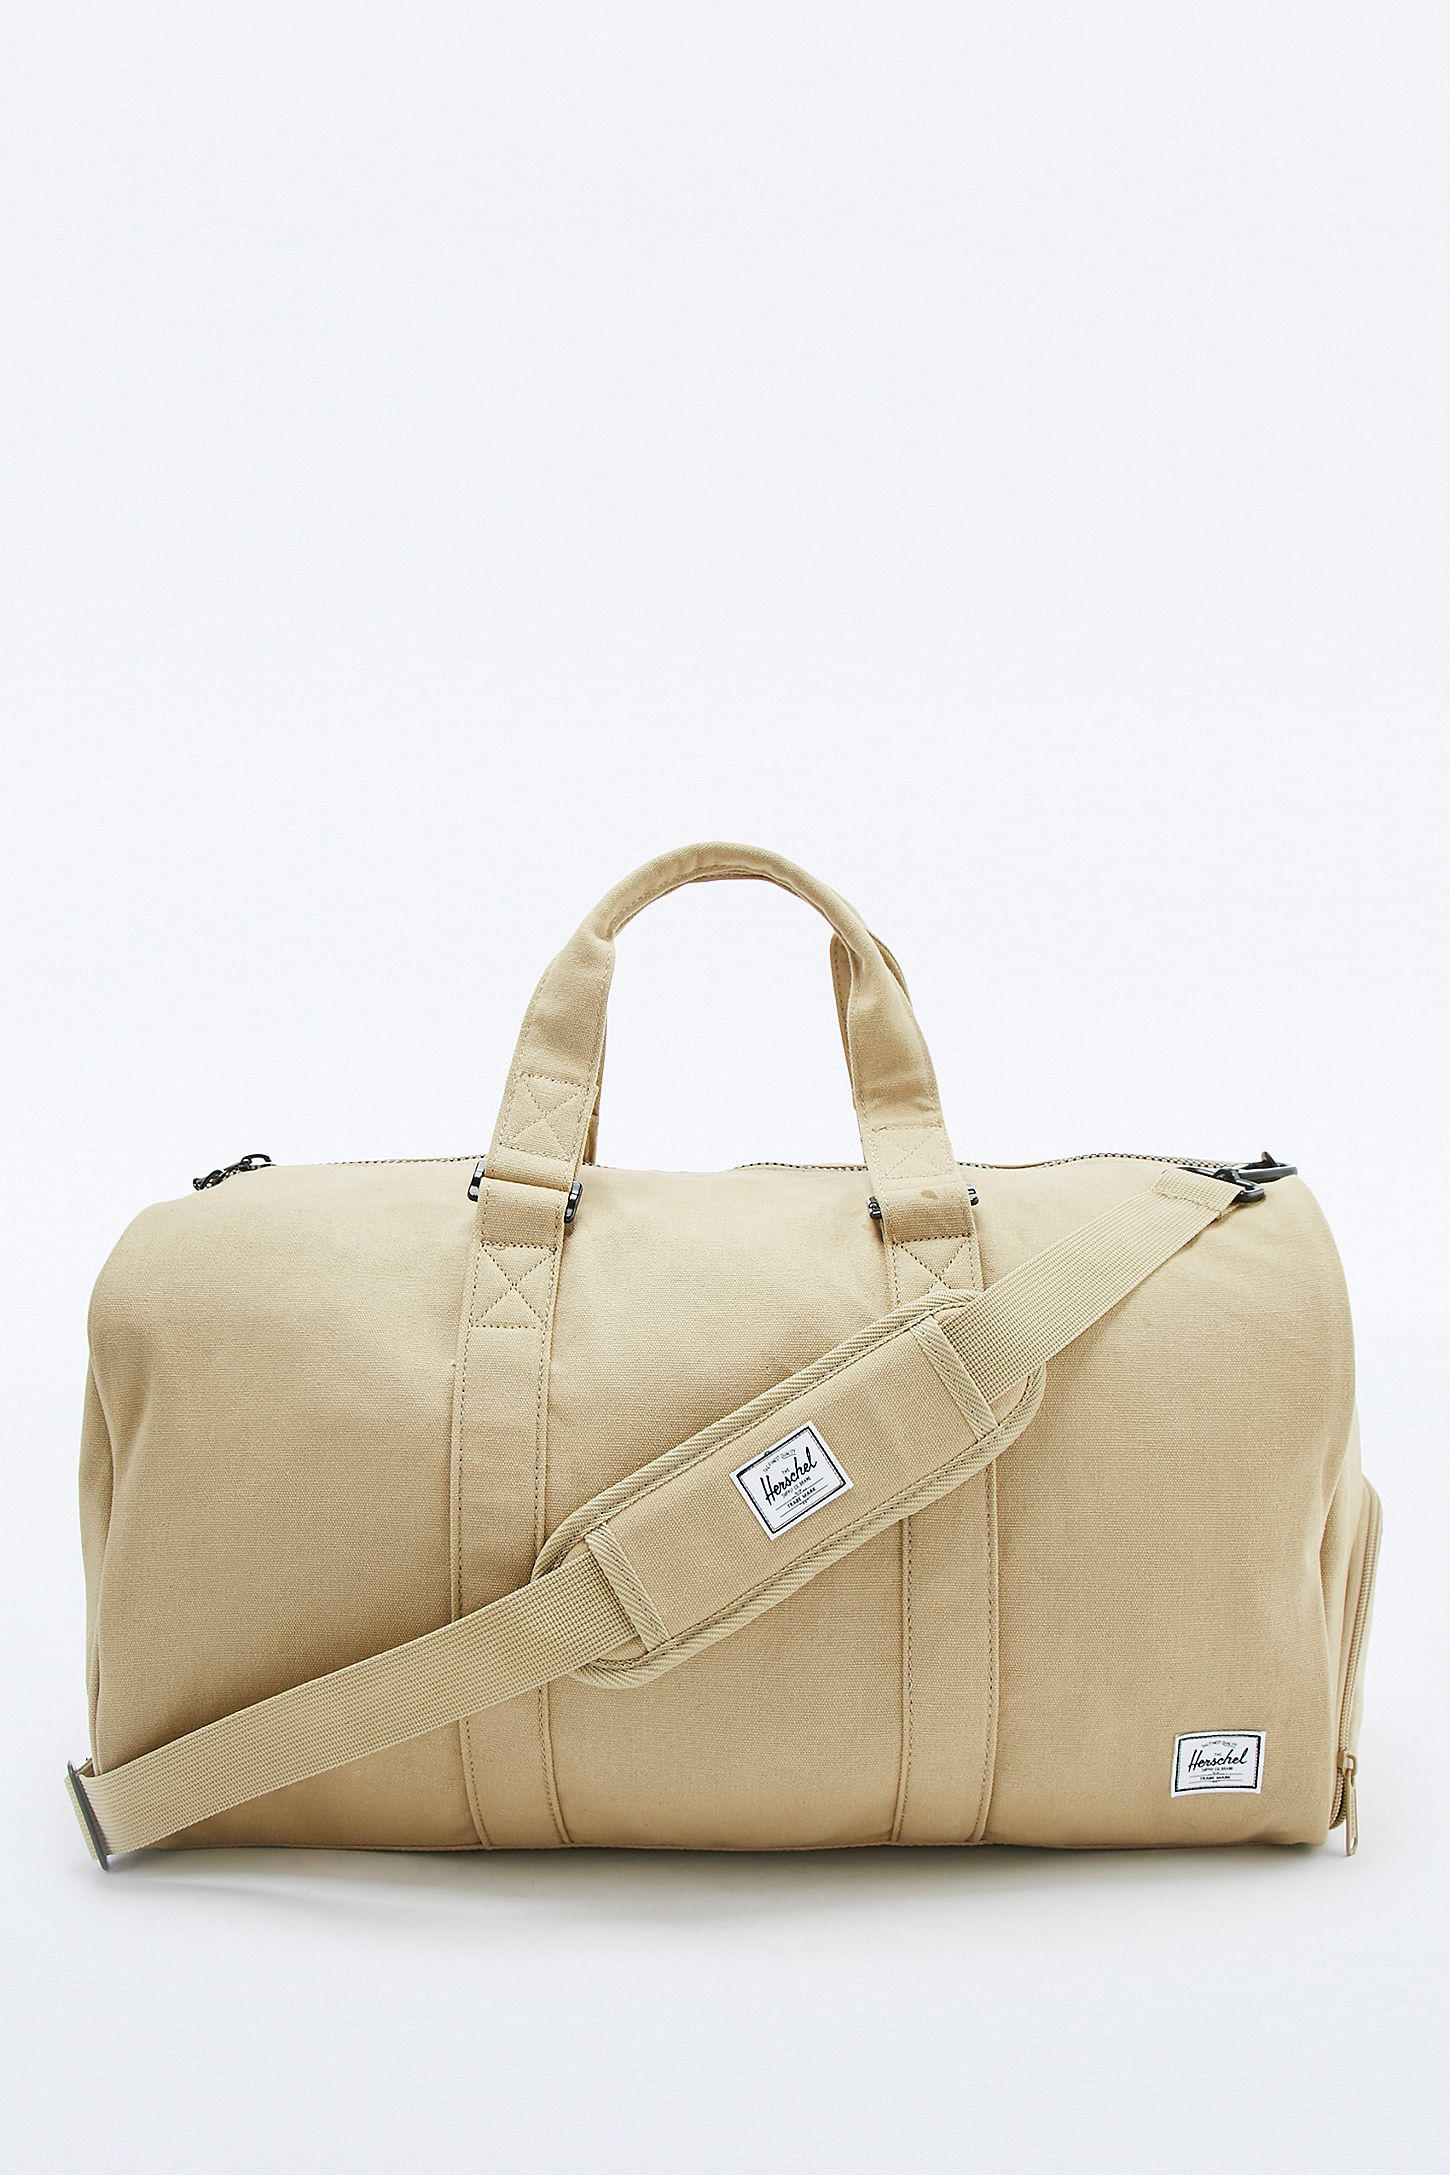 00a36b19559 Herschel Supply co. Novel Cotton Canvas Beige Holdall Bag